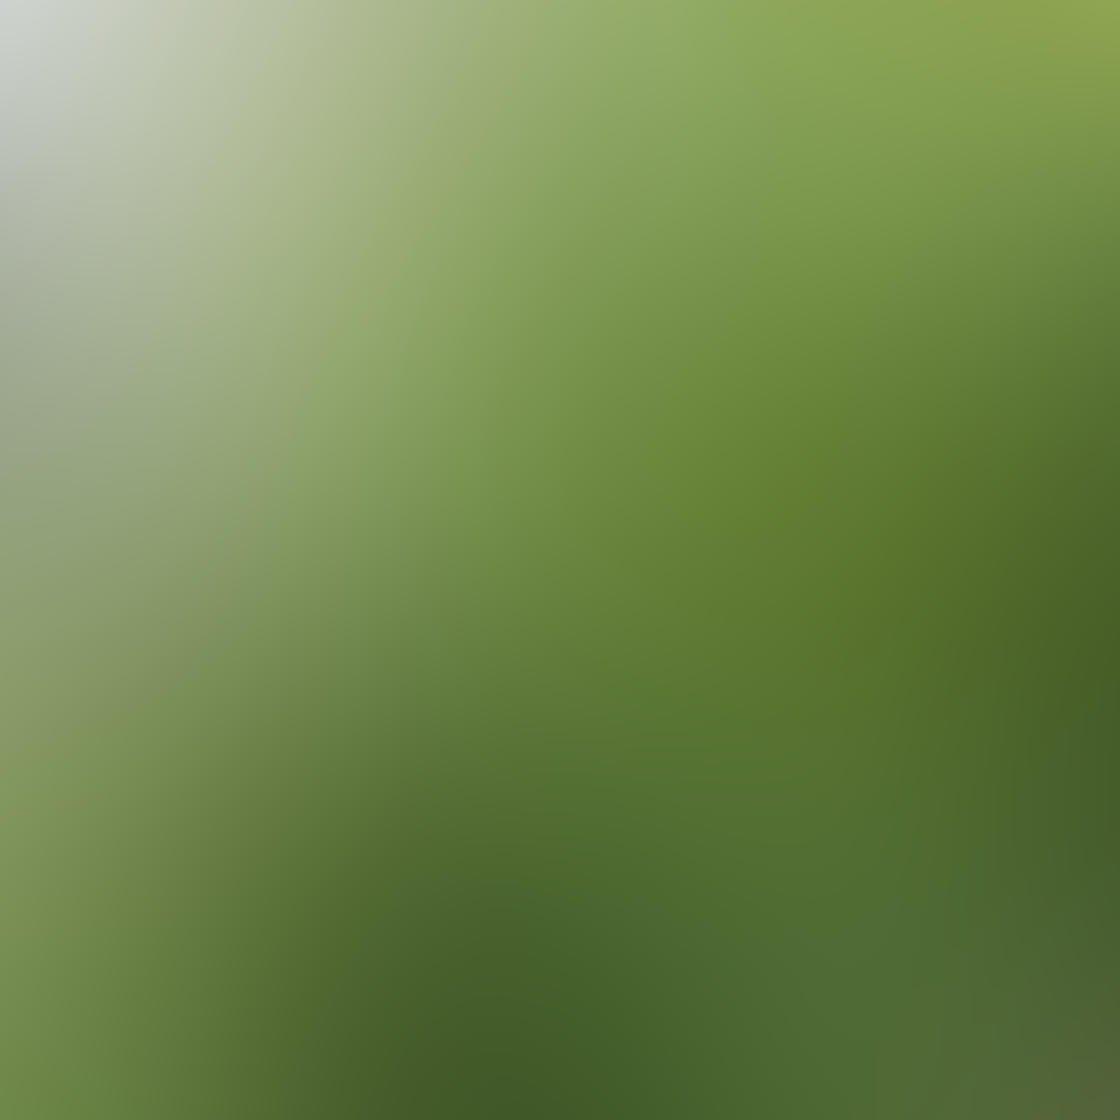 Ordinary iPhone Photo Subjects 8